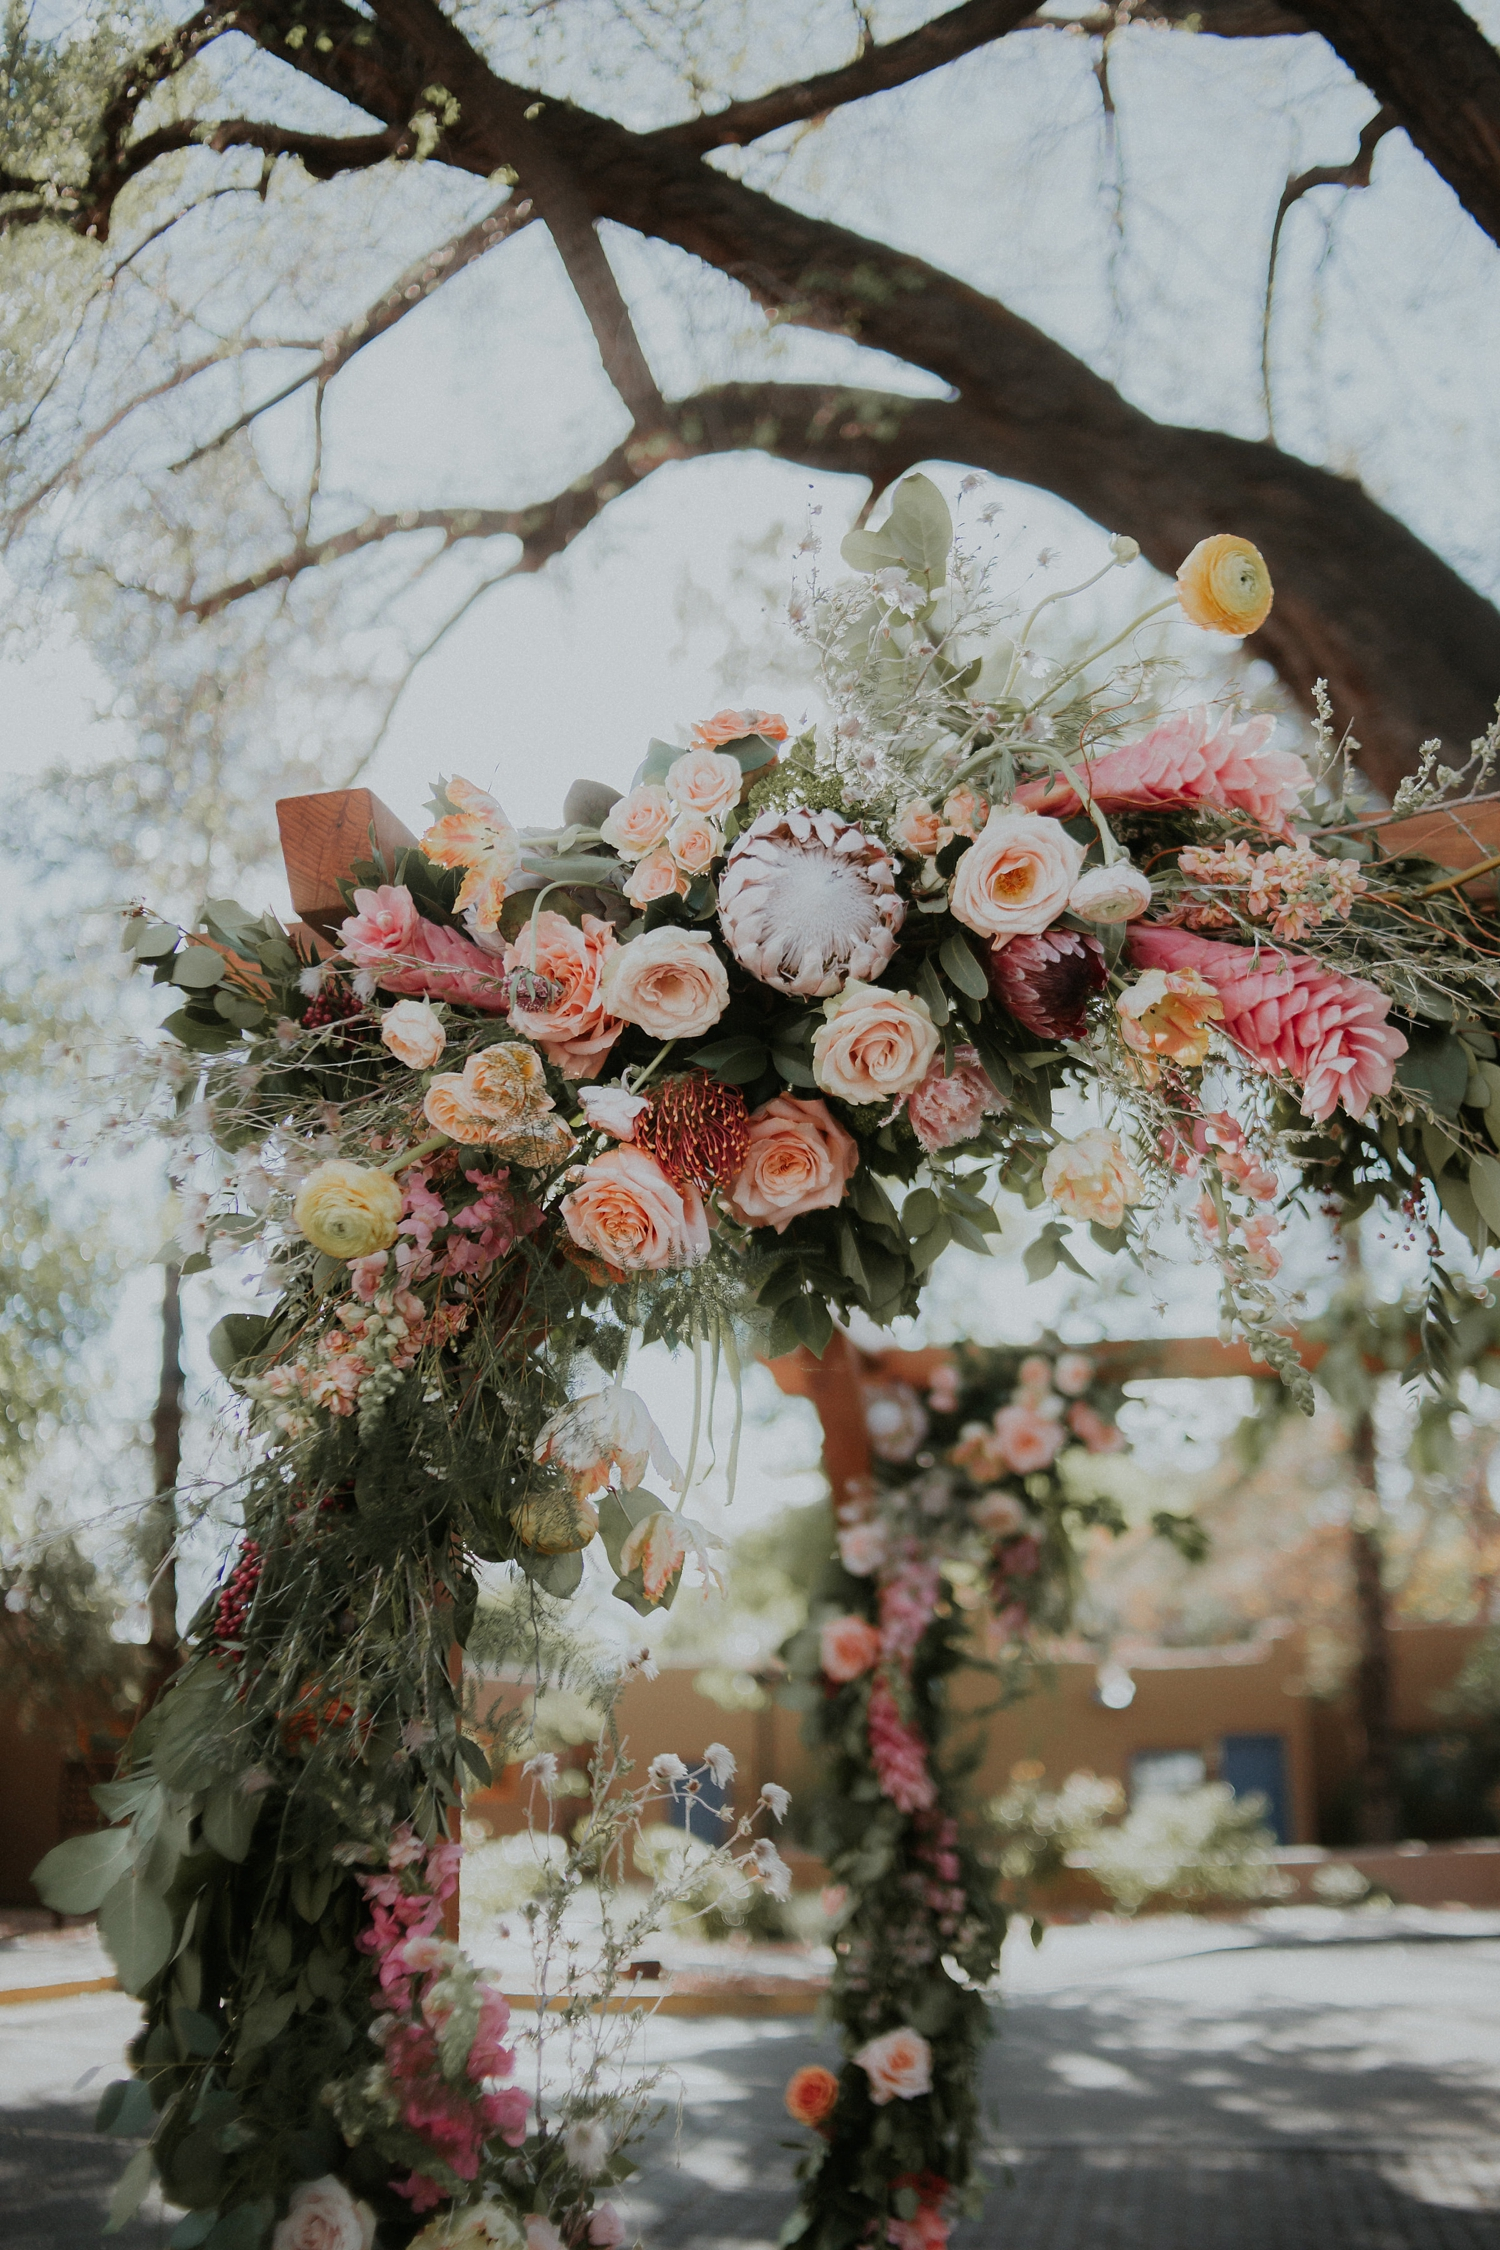 Alicia+lucia+photography+-+albuquerque+wedding+photographer+-+santa+fe+wedding+photography+-+new+mexico+wedding+photographer+-+wedding+flowers+-+summer+wedding+flowers_0007.jpg